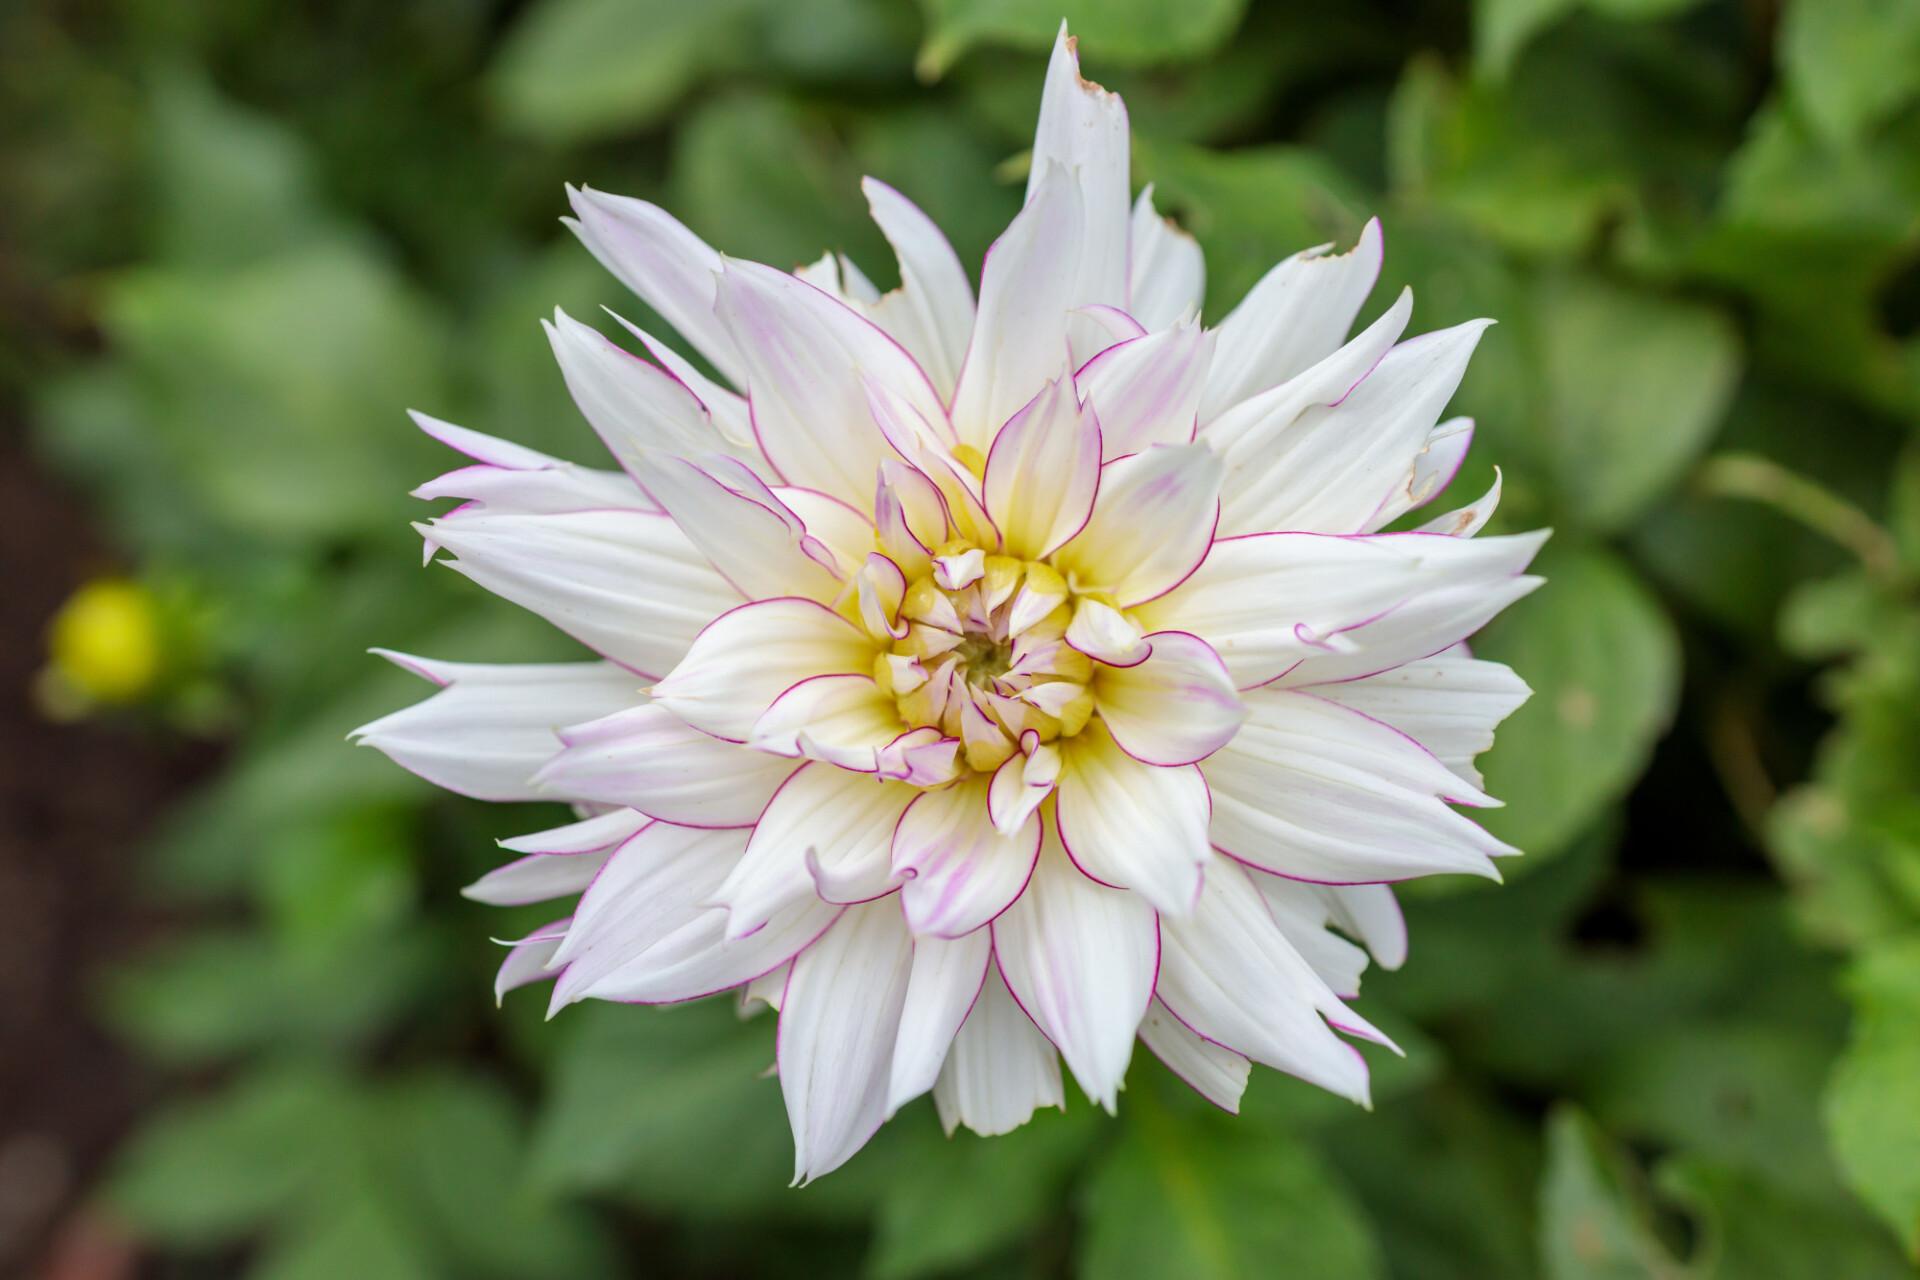 Beautiful White Dahlia Flower In Garden